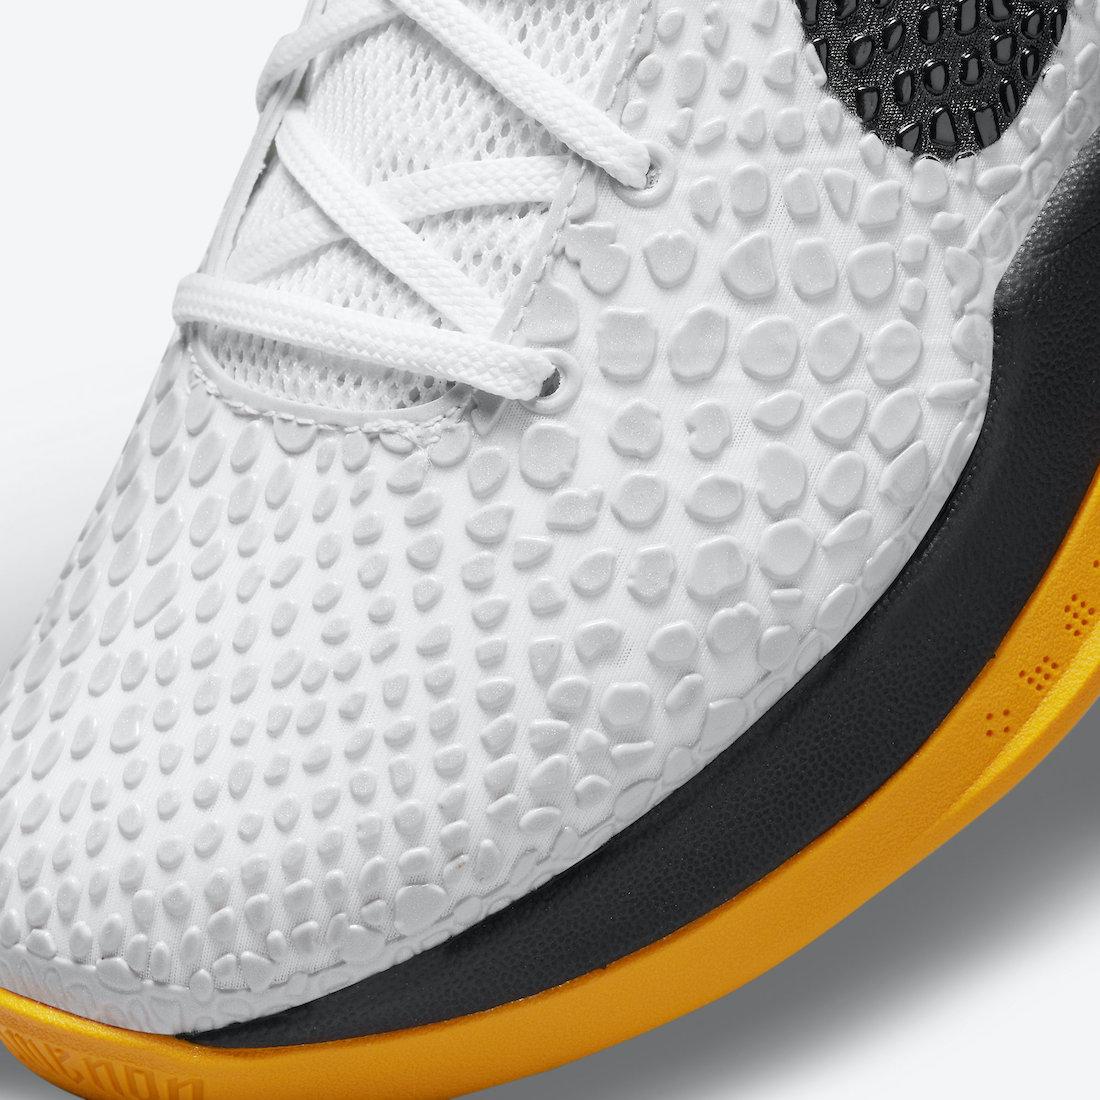 Nike Kobe 6 Protro POP White Del Sol CW2190-100 Release Date Info